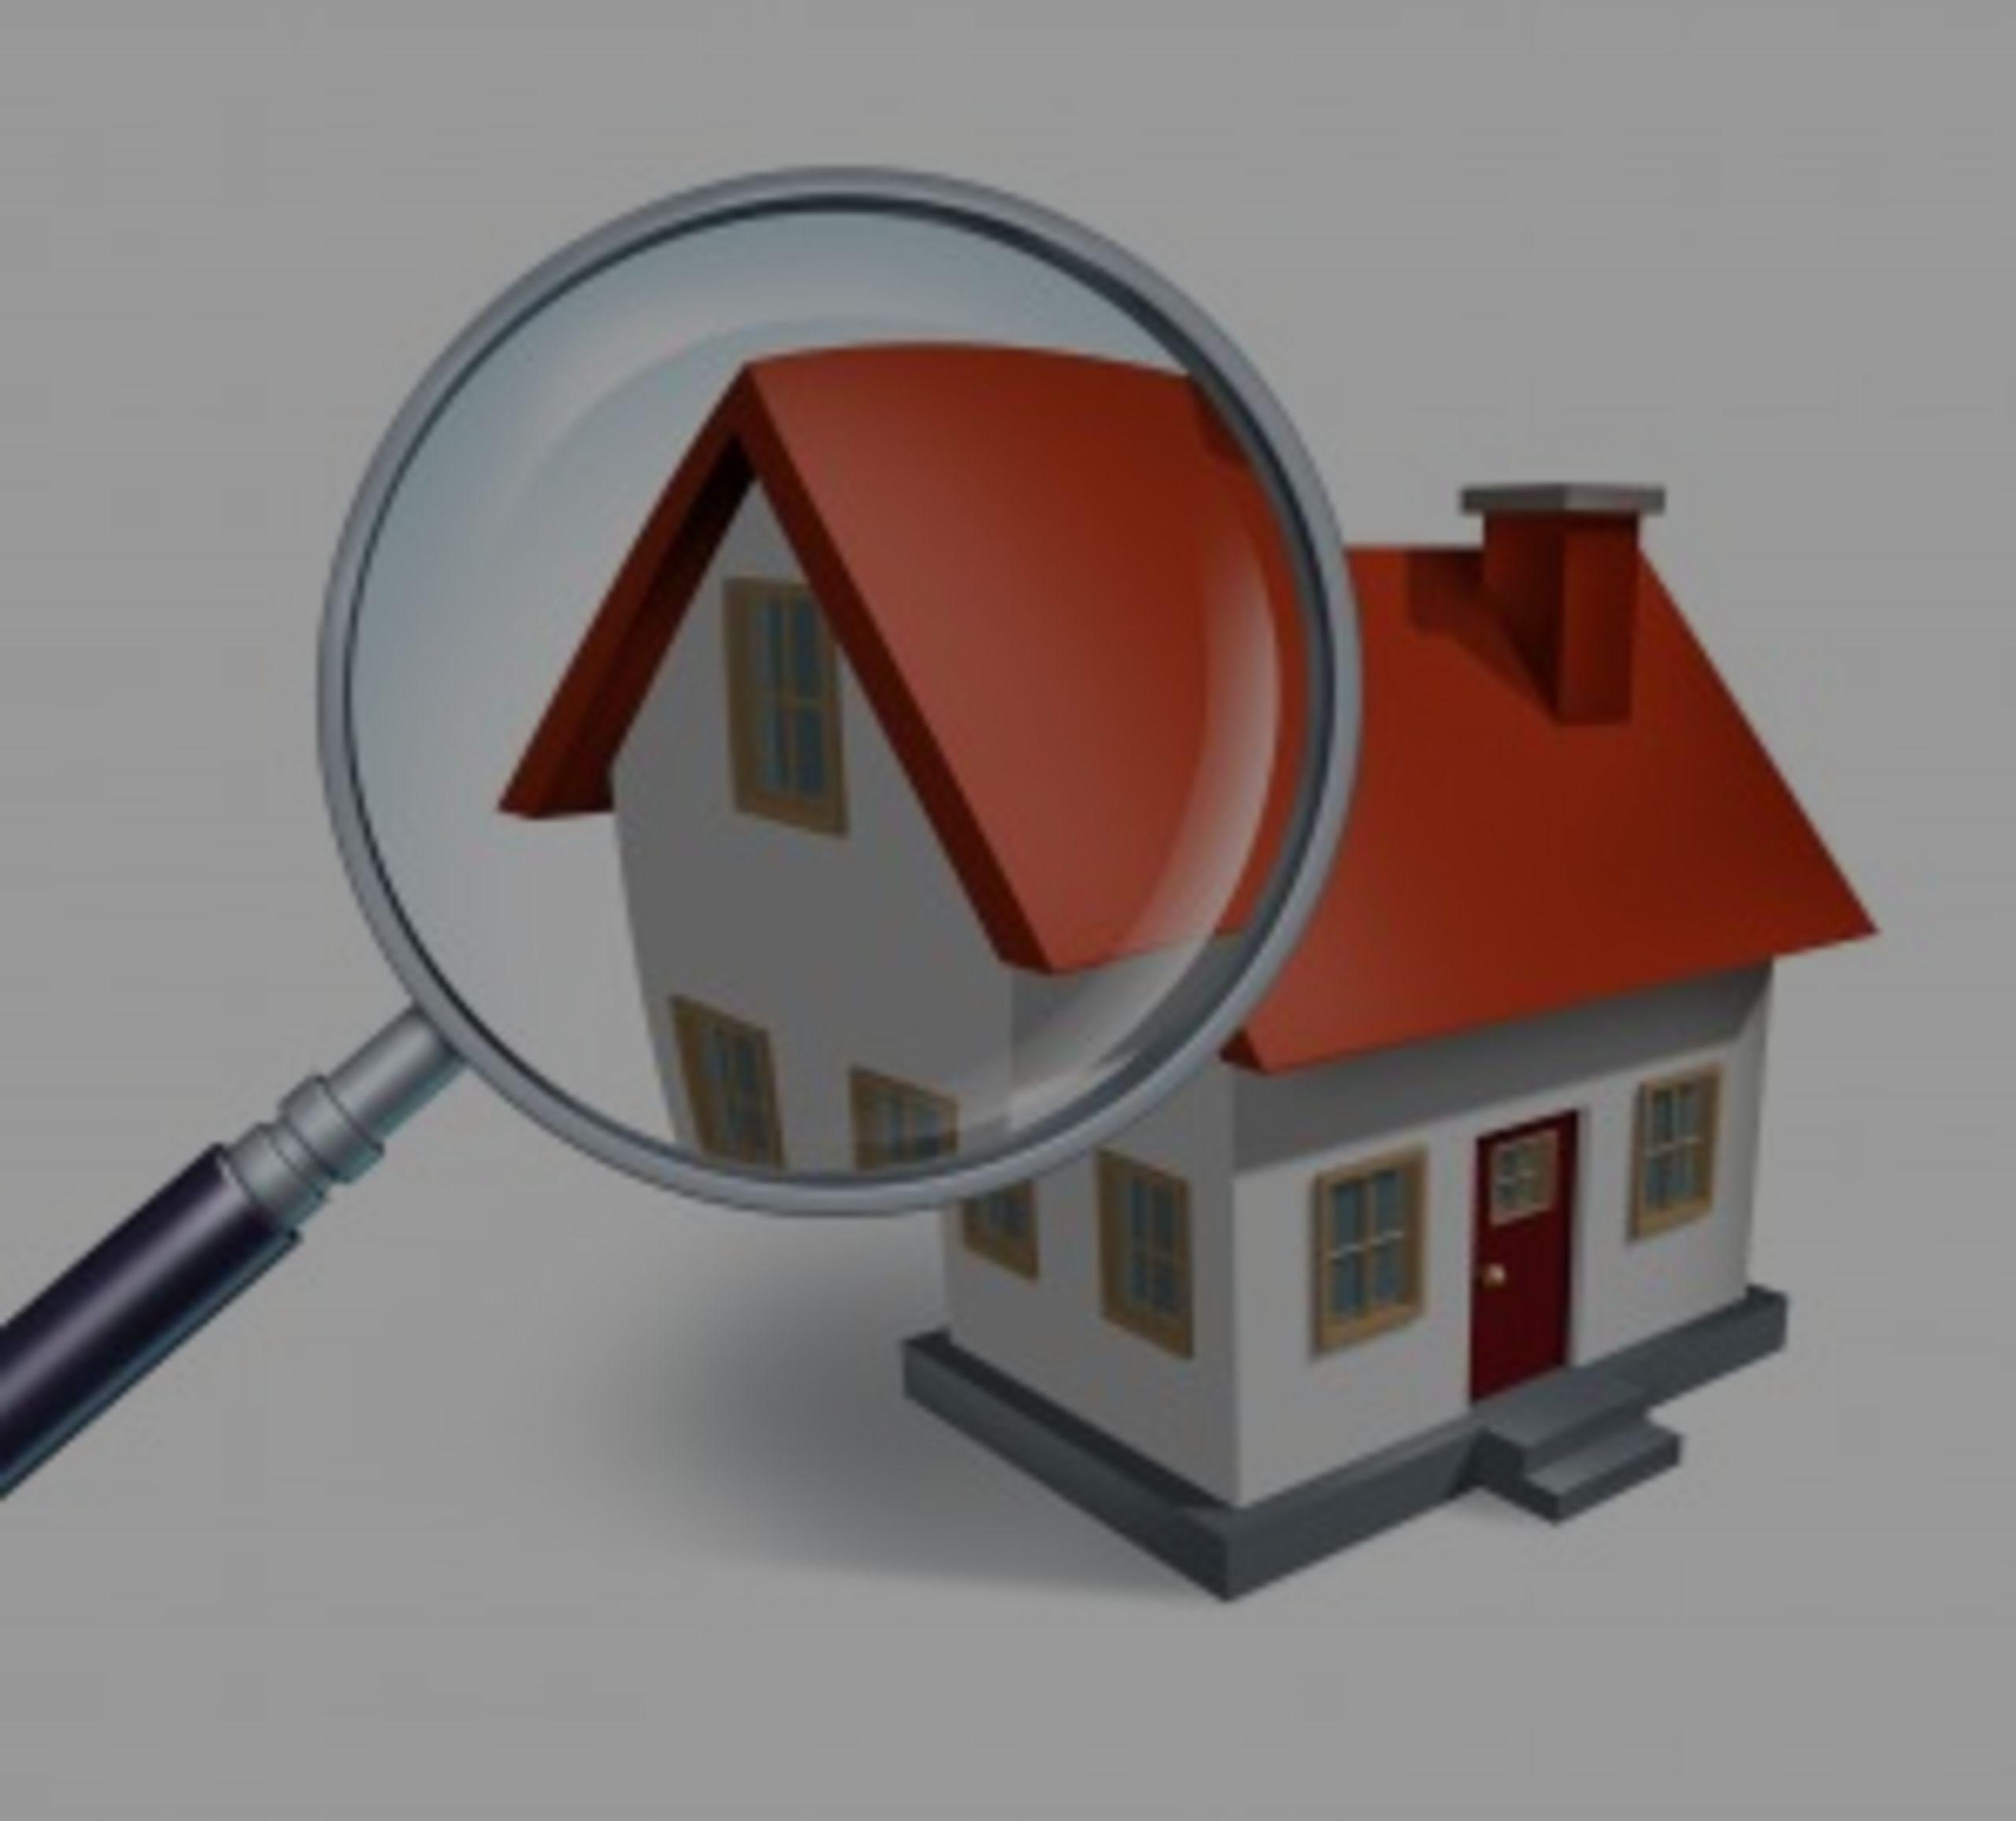 Do I Really Need a Home Inspection?